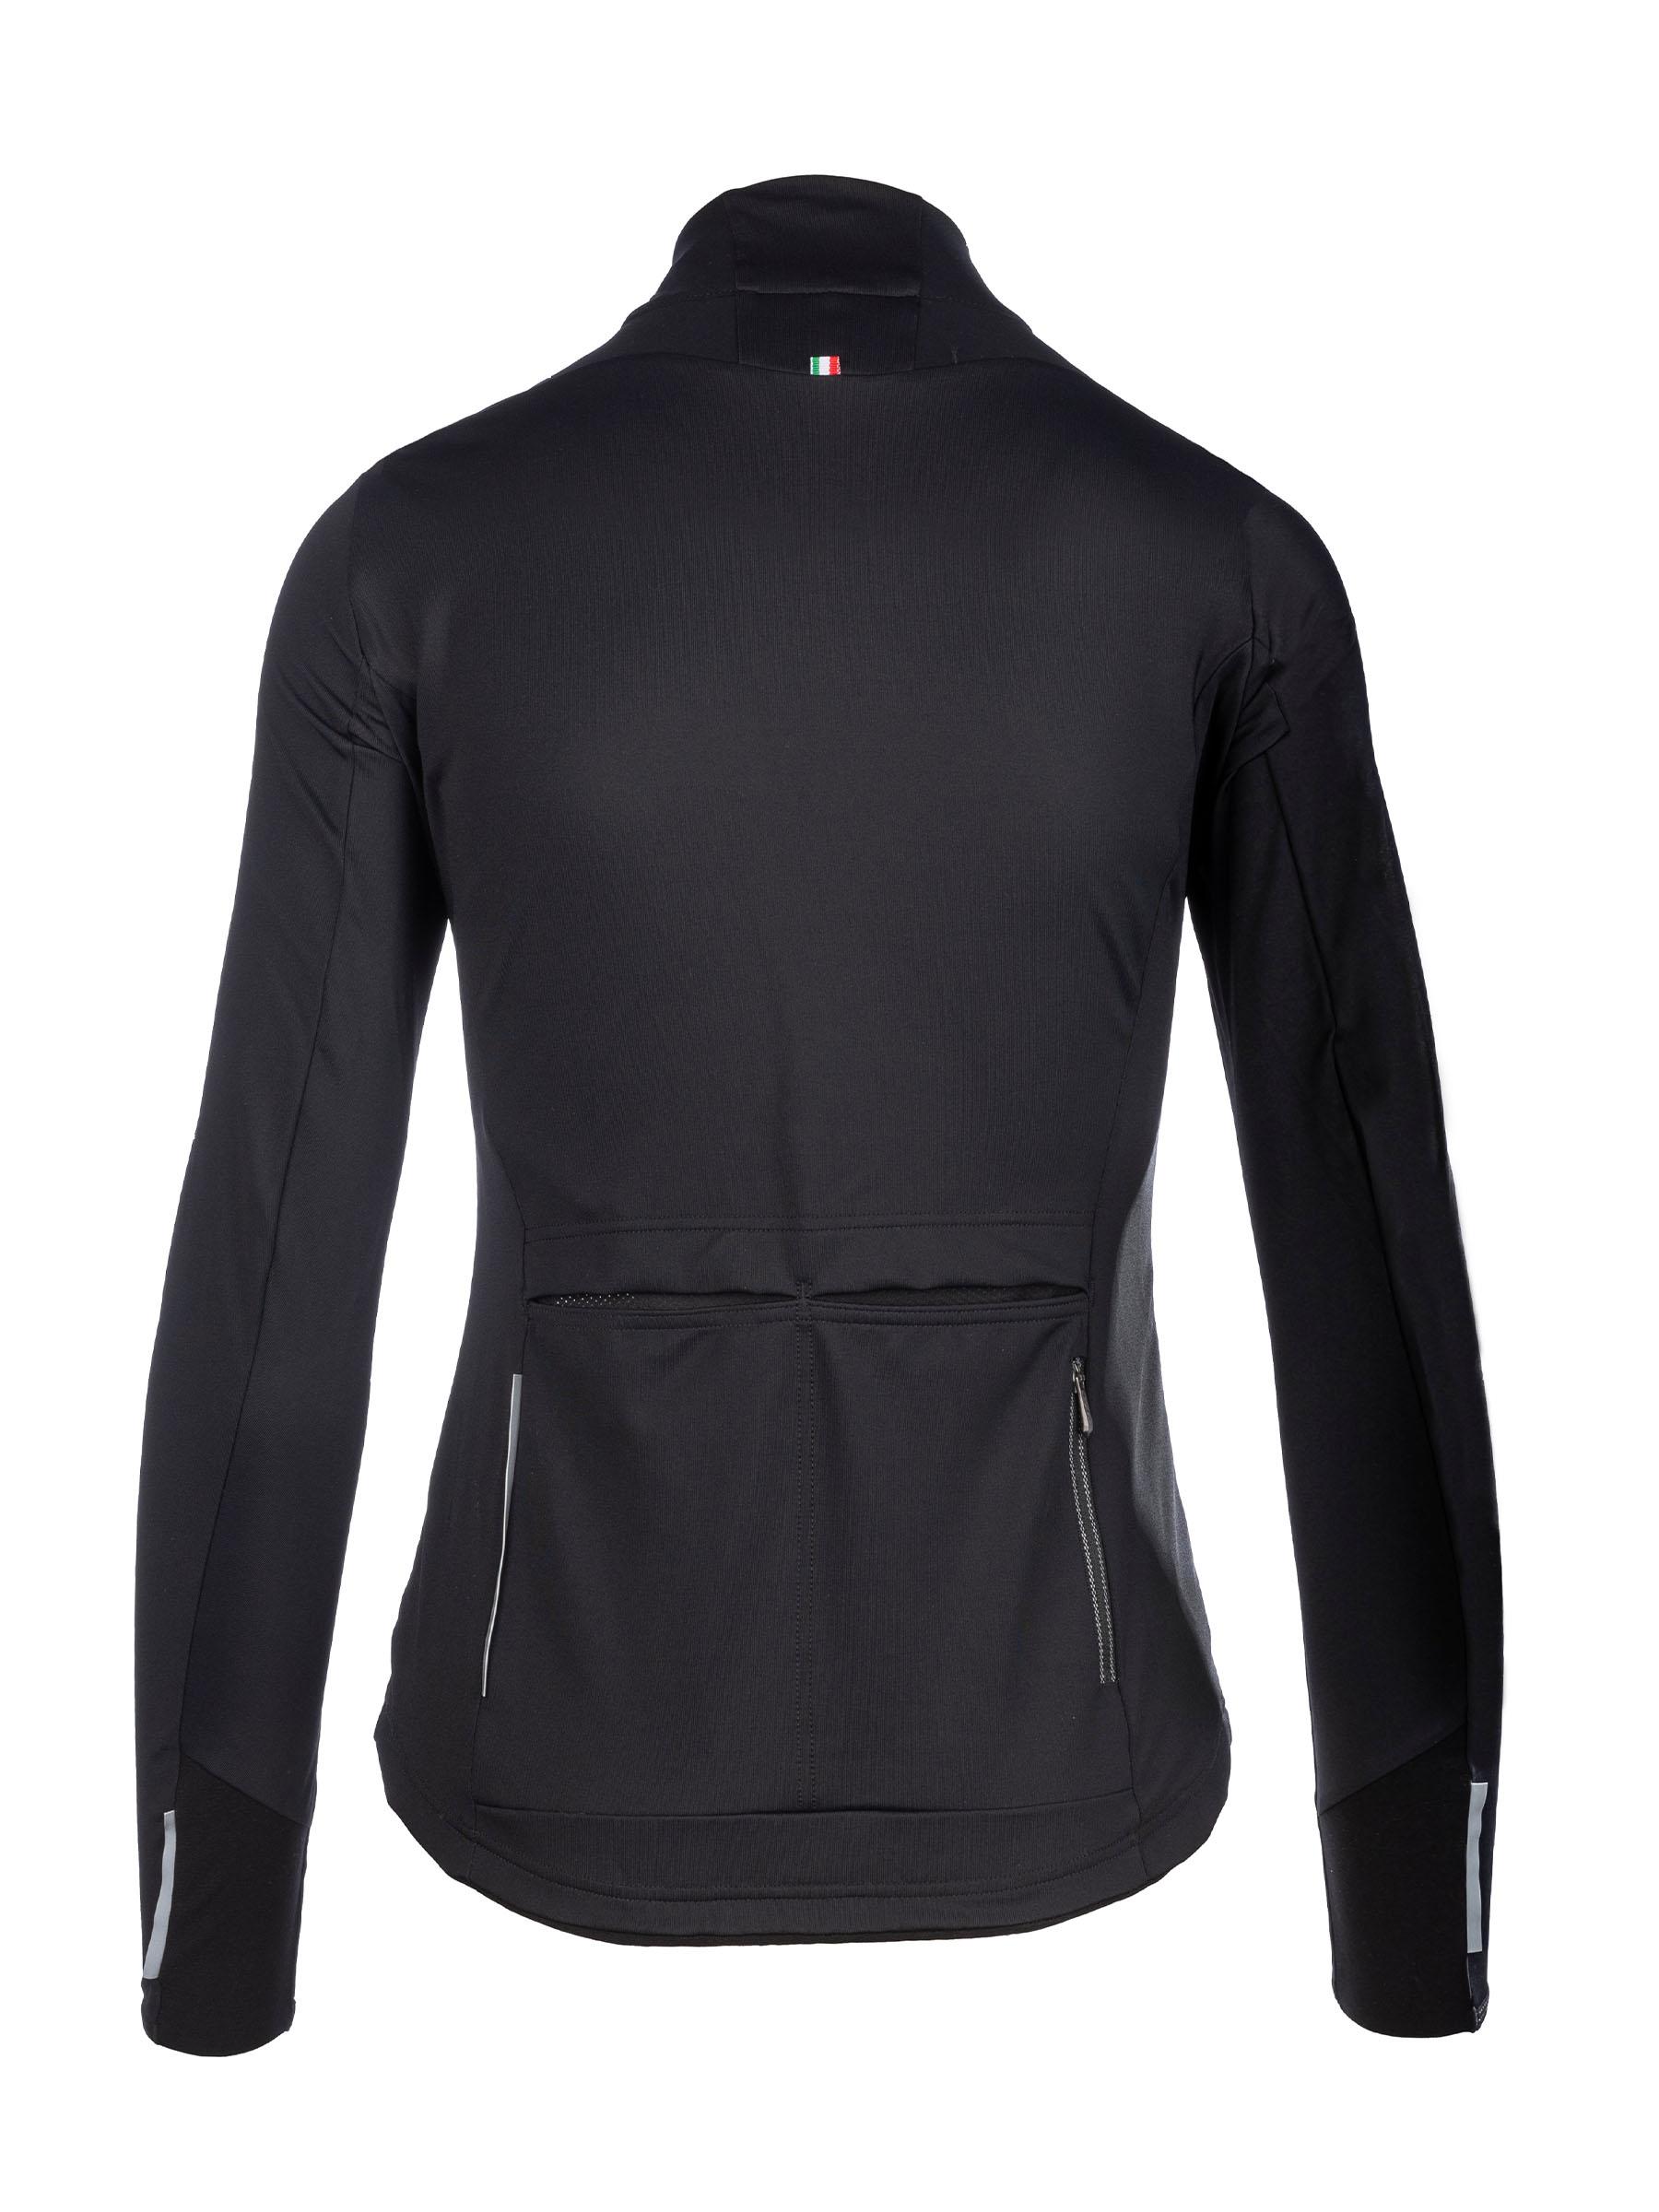 Chaqueta Hybrid Jacket Lady negra